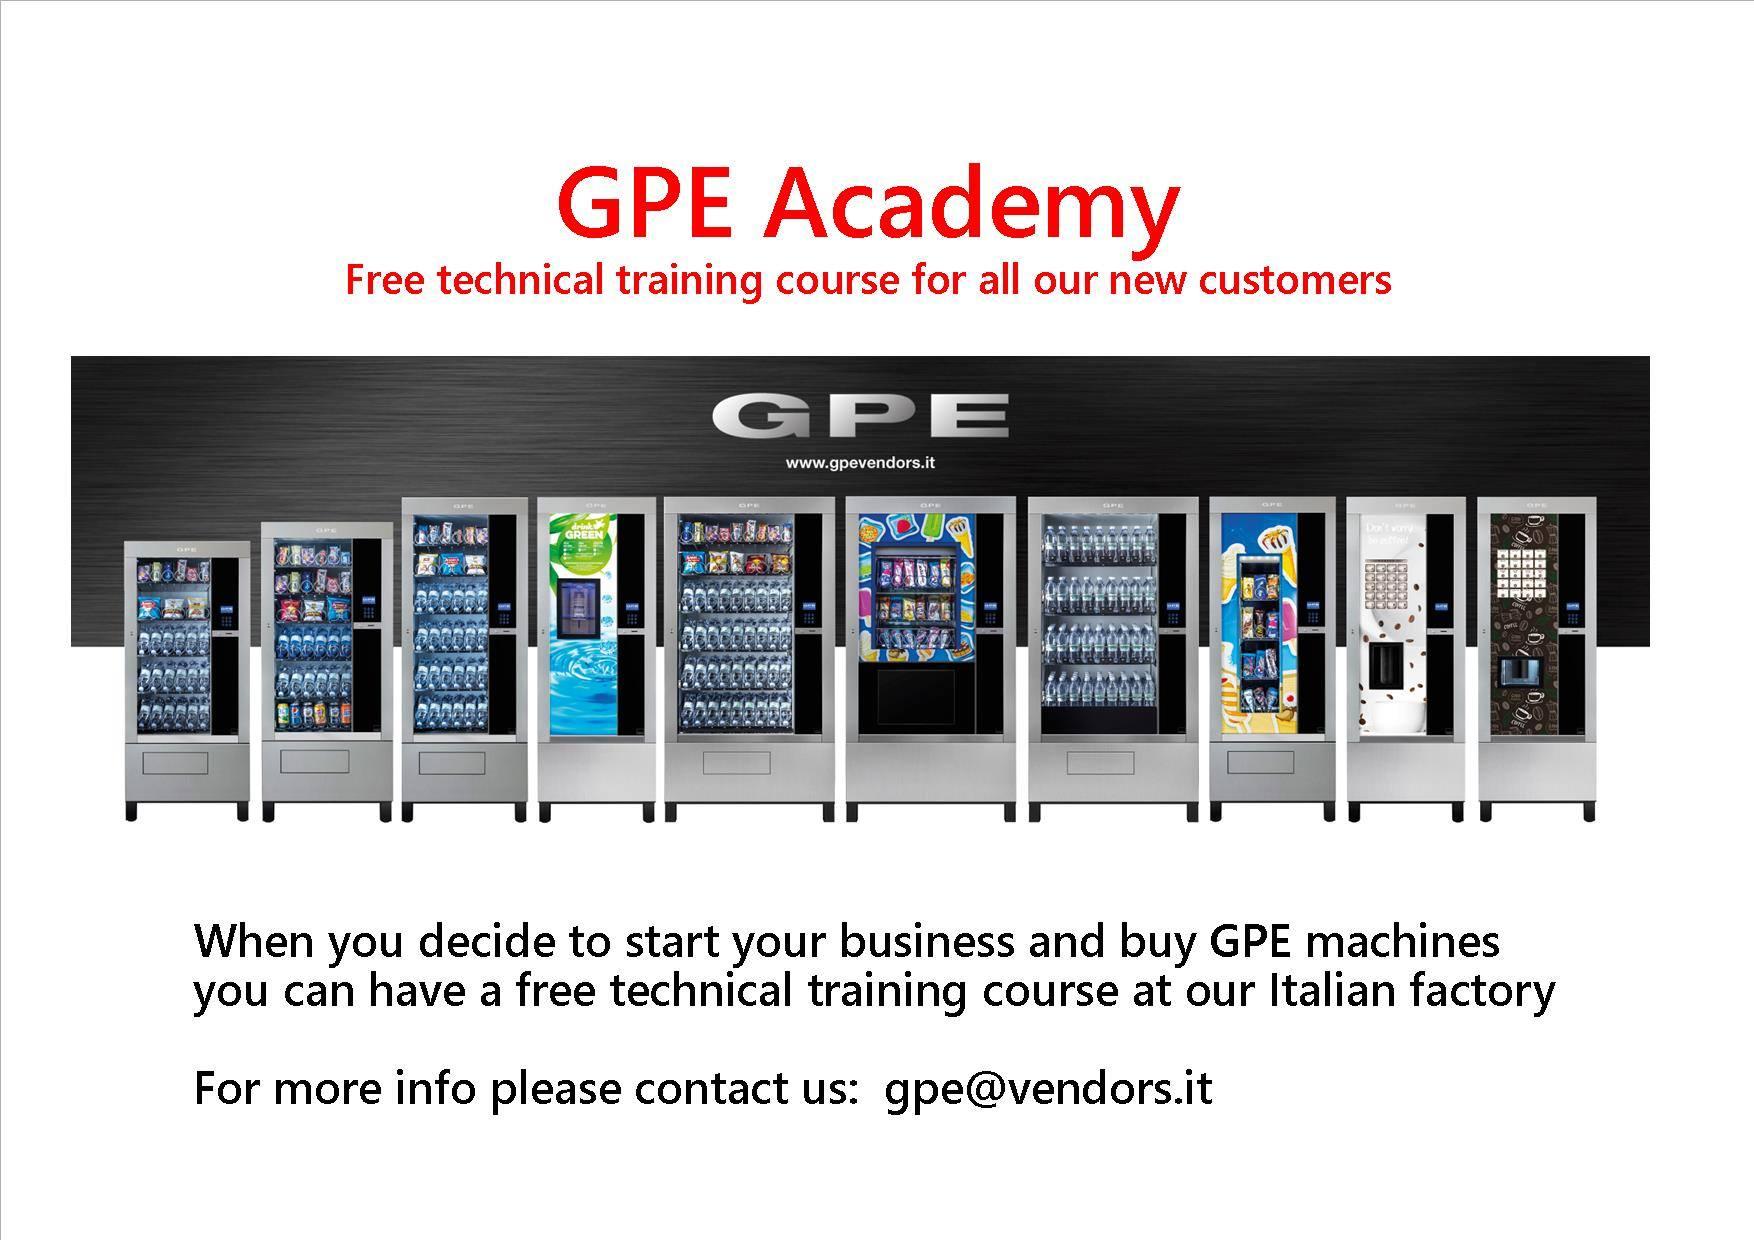 GPE Academy